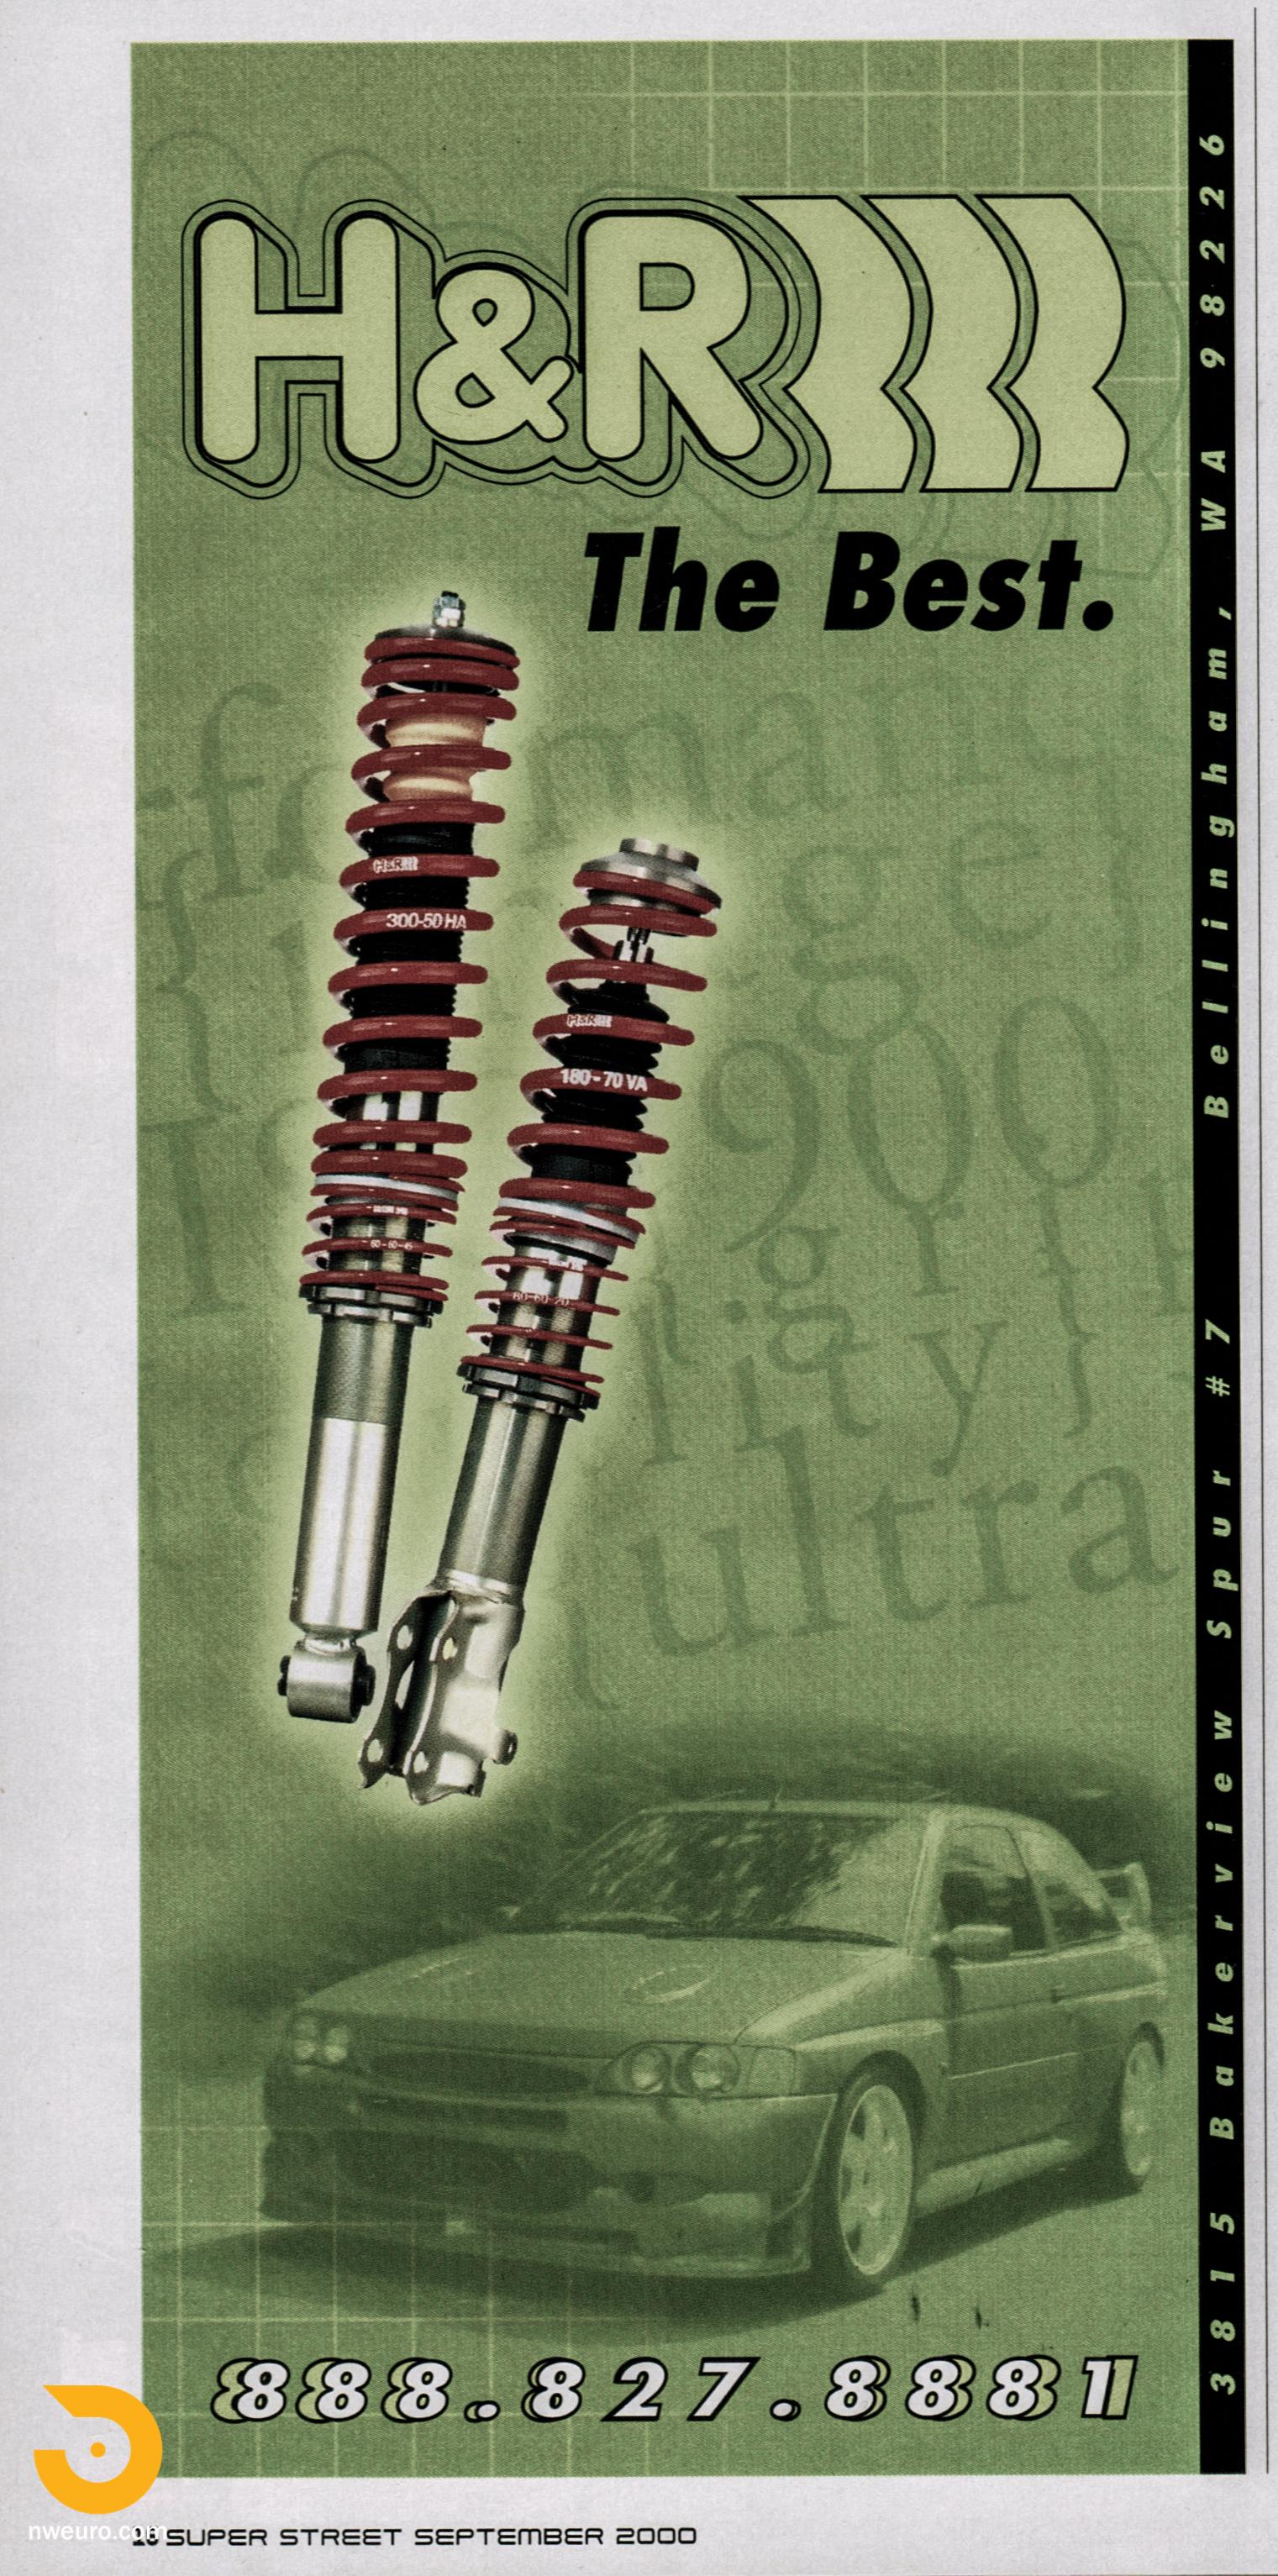 H&R Ad - Gold Cosworth-1.jpg